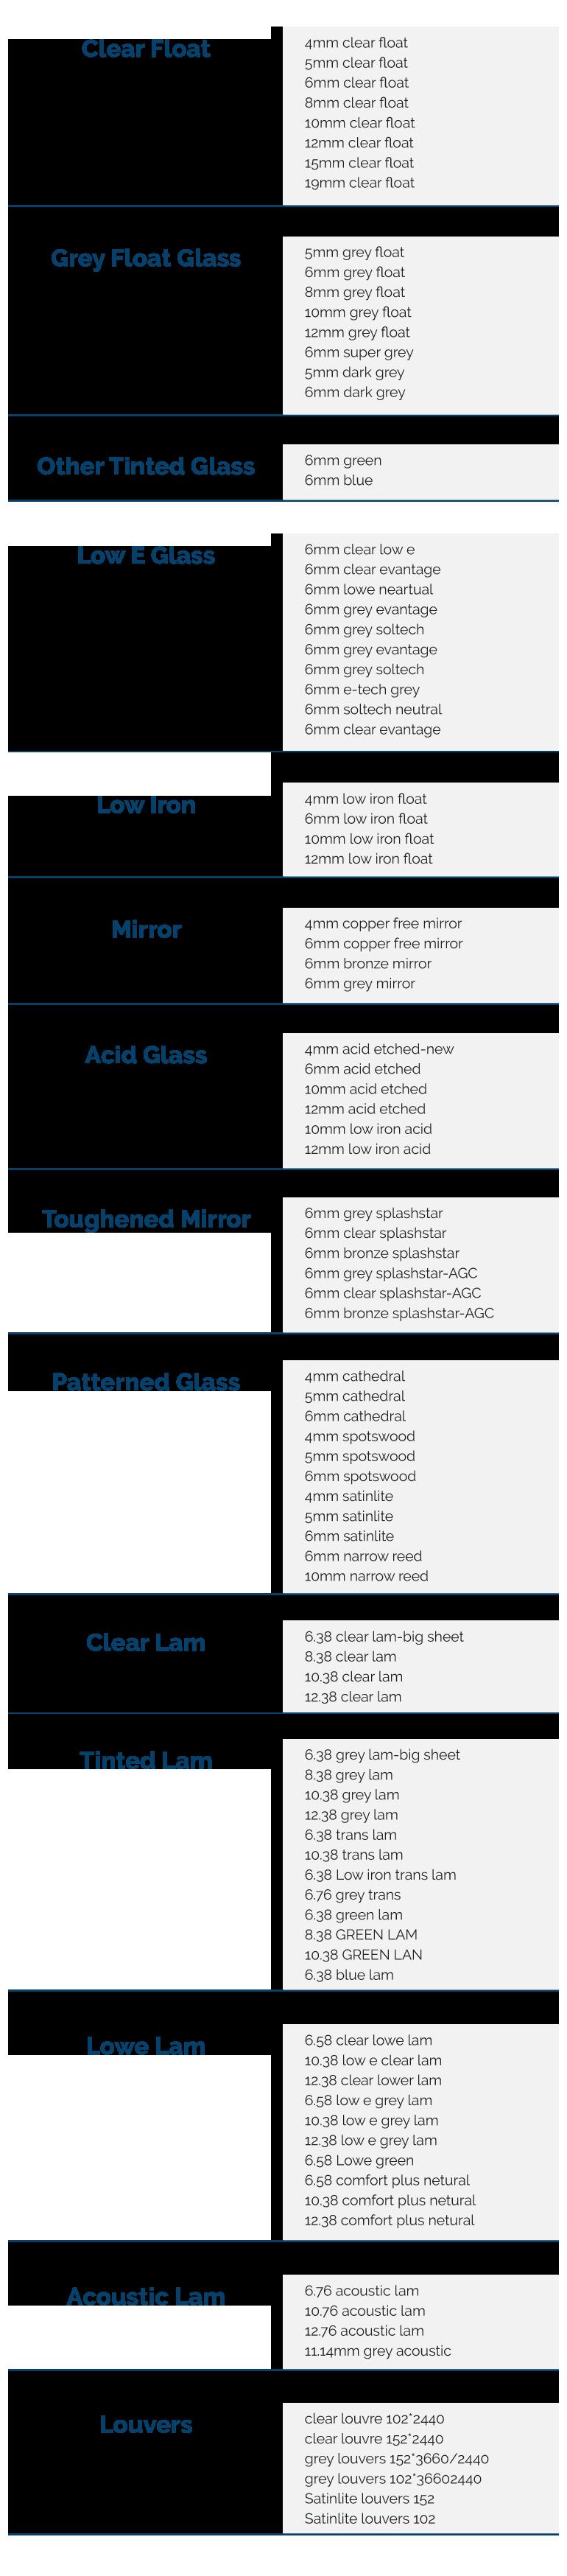 customised-glass-Jun-2021--Mercury-Glass